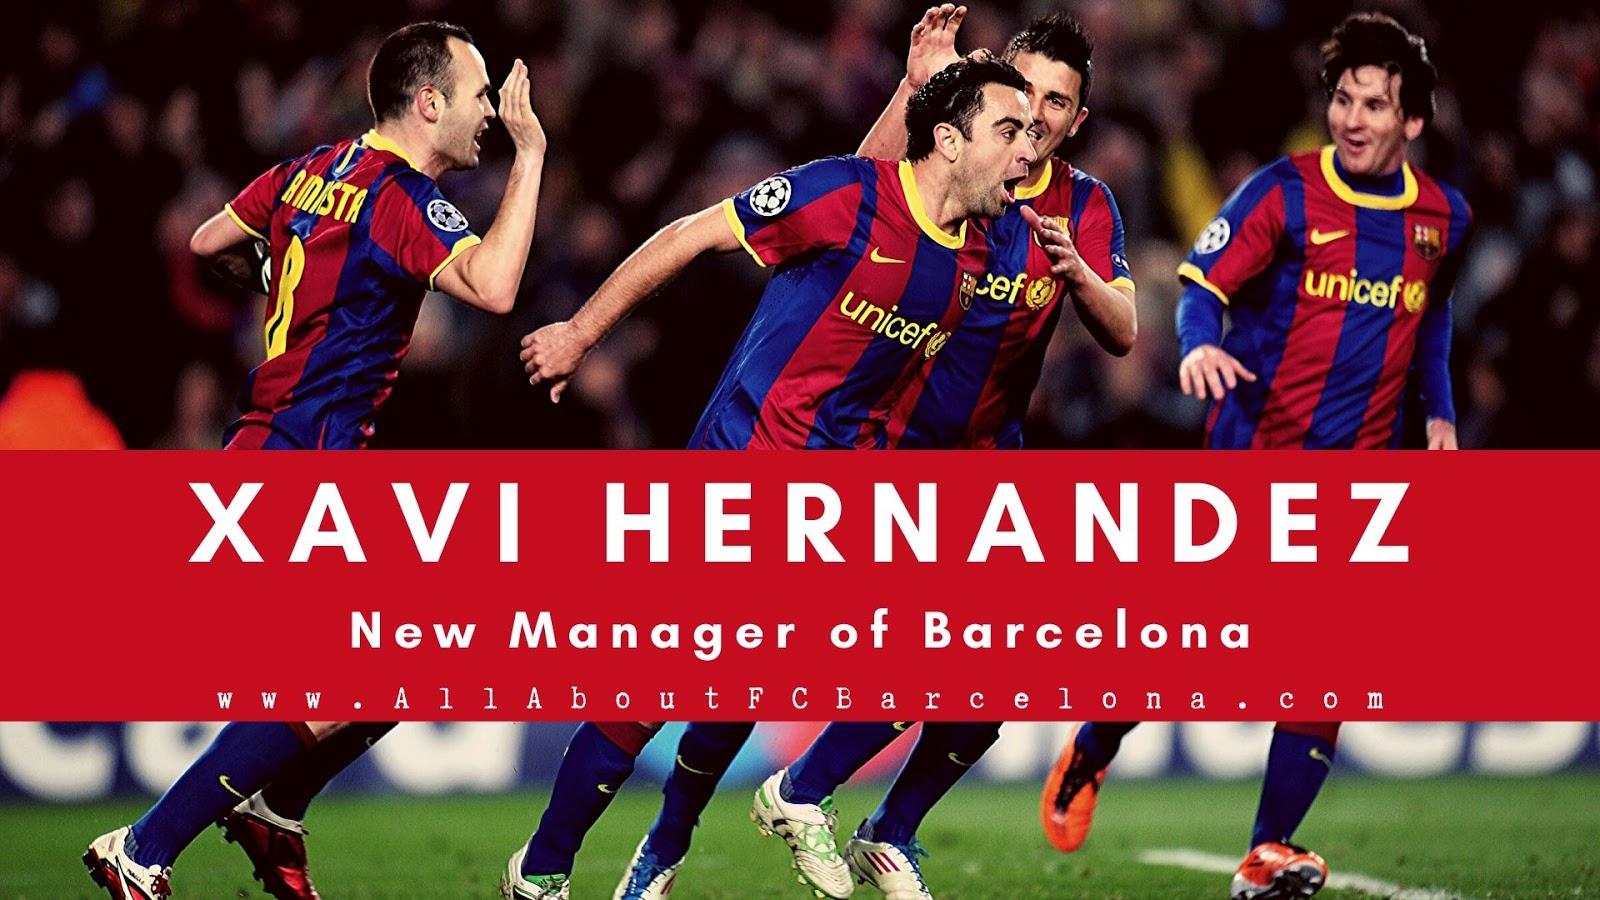 Barcelona Legend Xavi Hernandez To Be Announced As Coach Of Barcelona On Monday